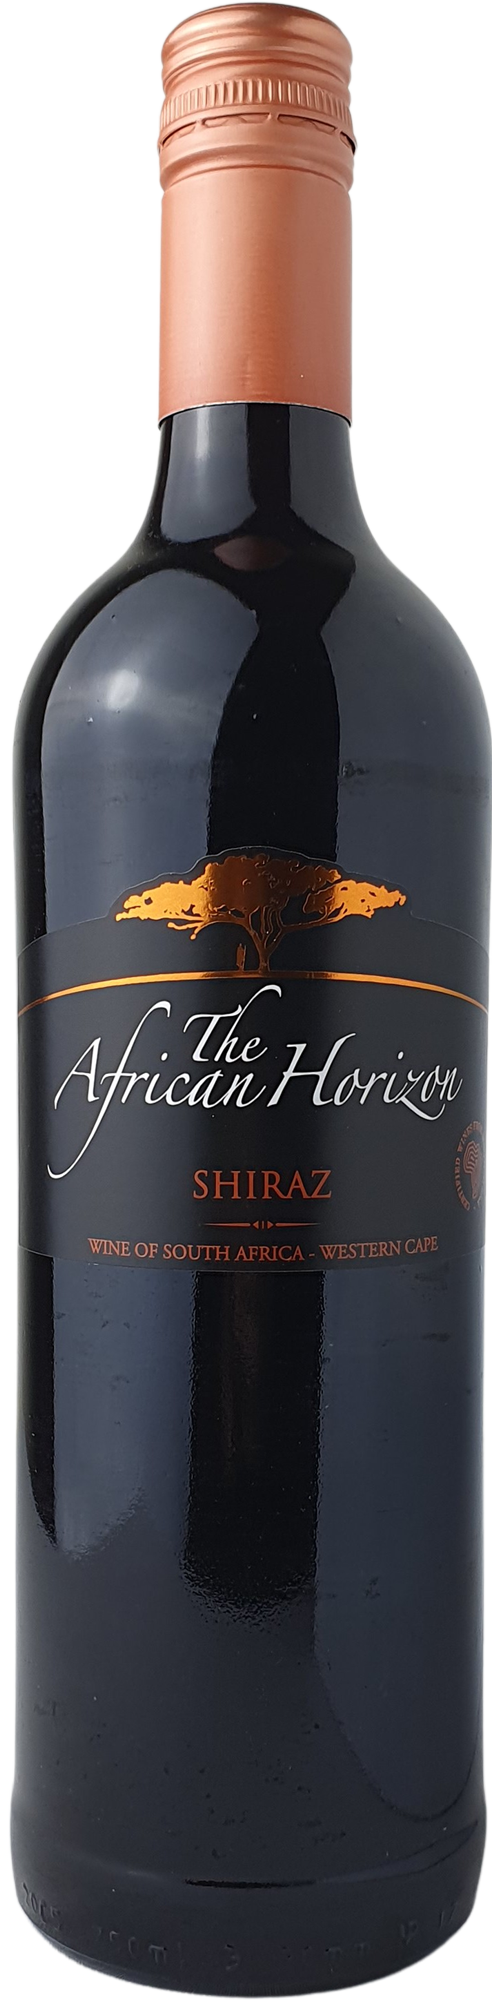 2020 The African Horizon Shiraz